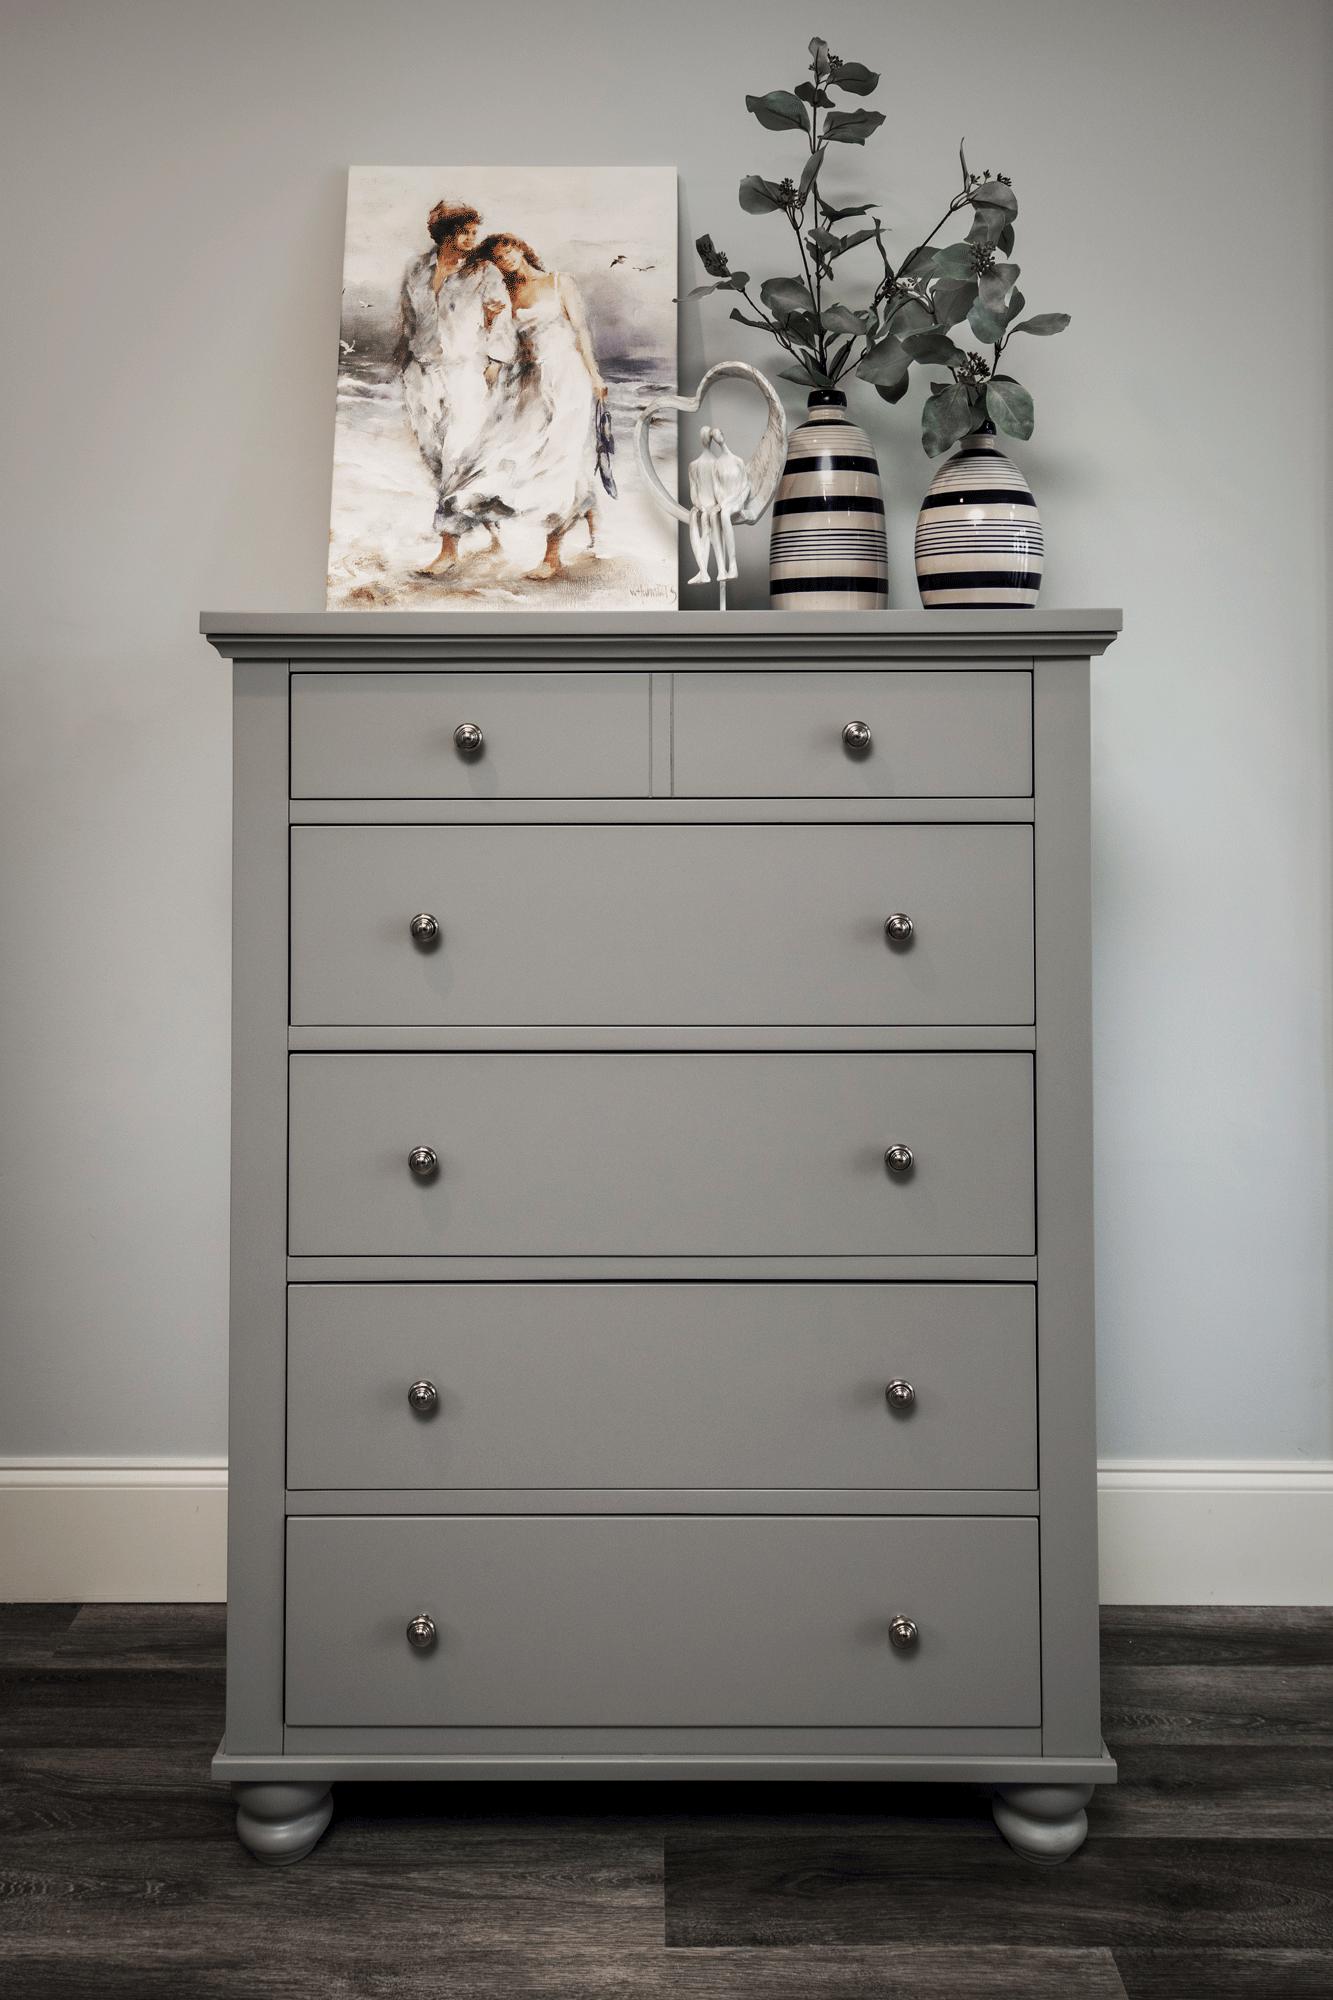 Bedroom decor with grey dresser